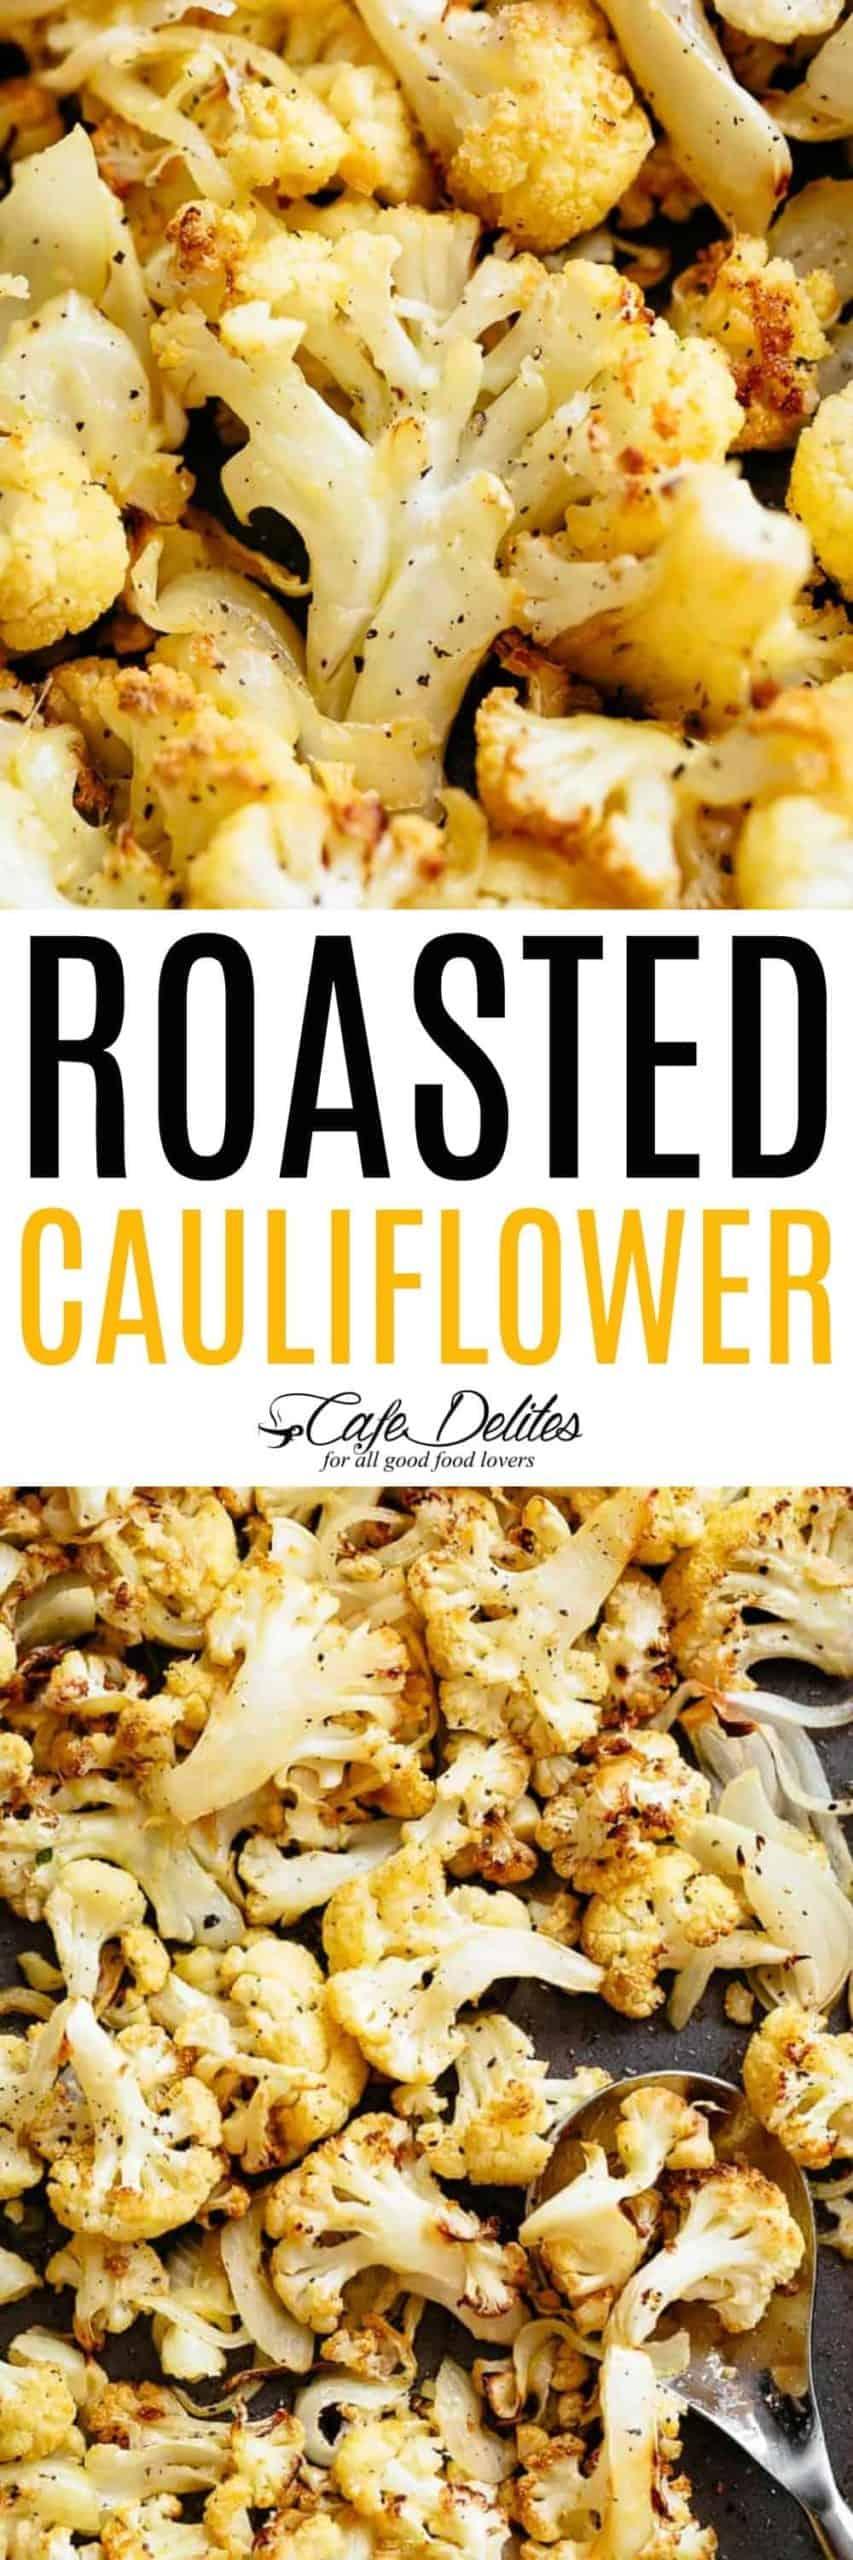 Roasted Cauliflower Recipe | cafedelites.com